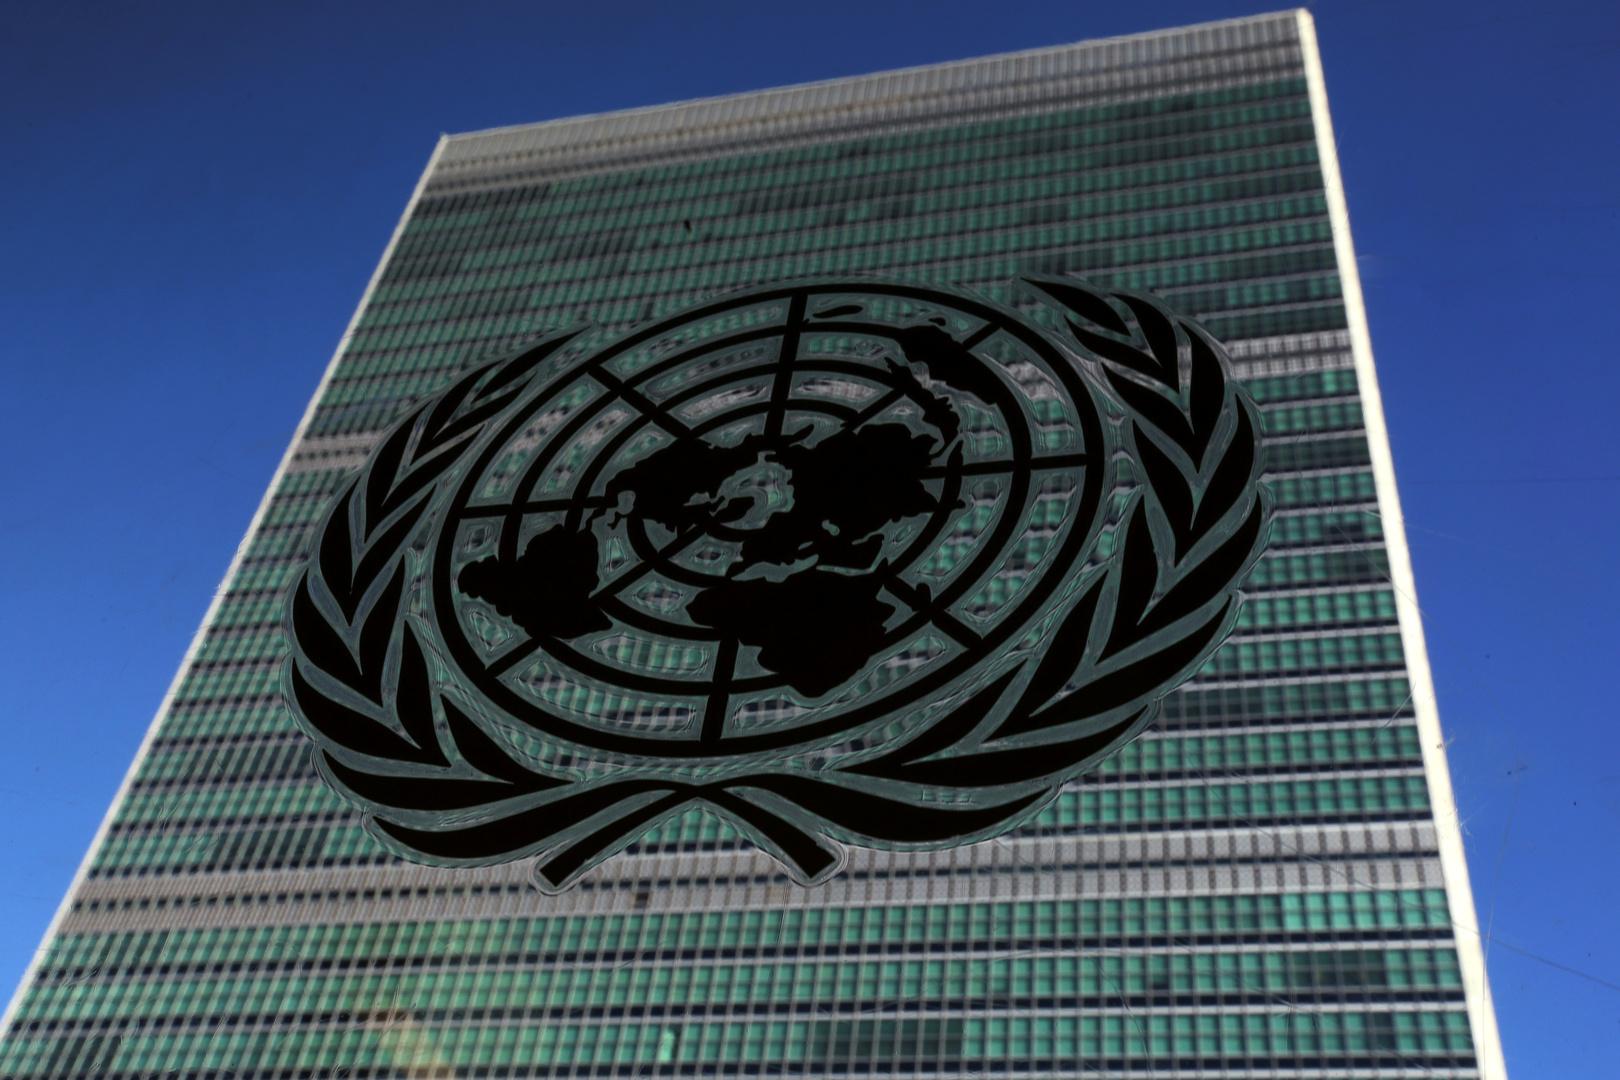 وسائل إعلام: 10 دول بصدد سحب اعترافها باستقلال كوسوفو